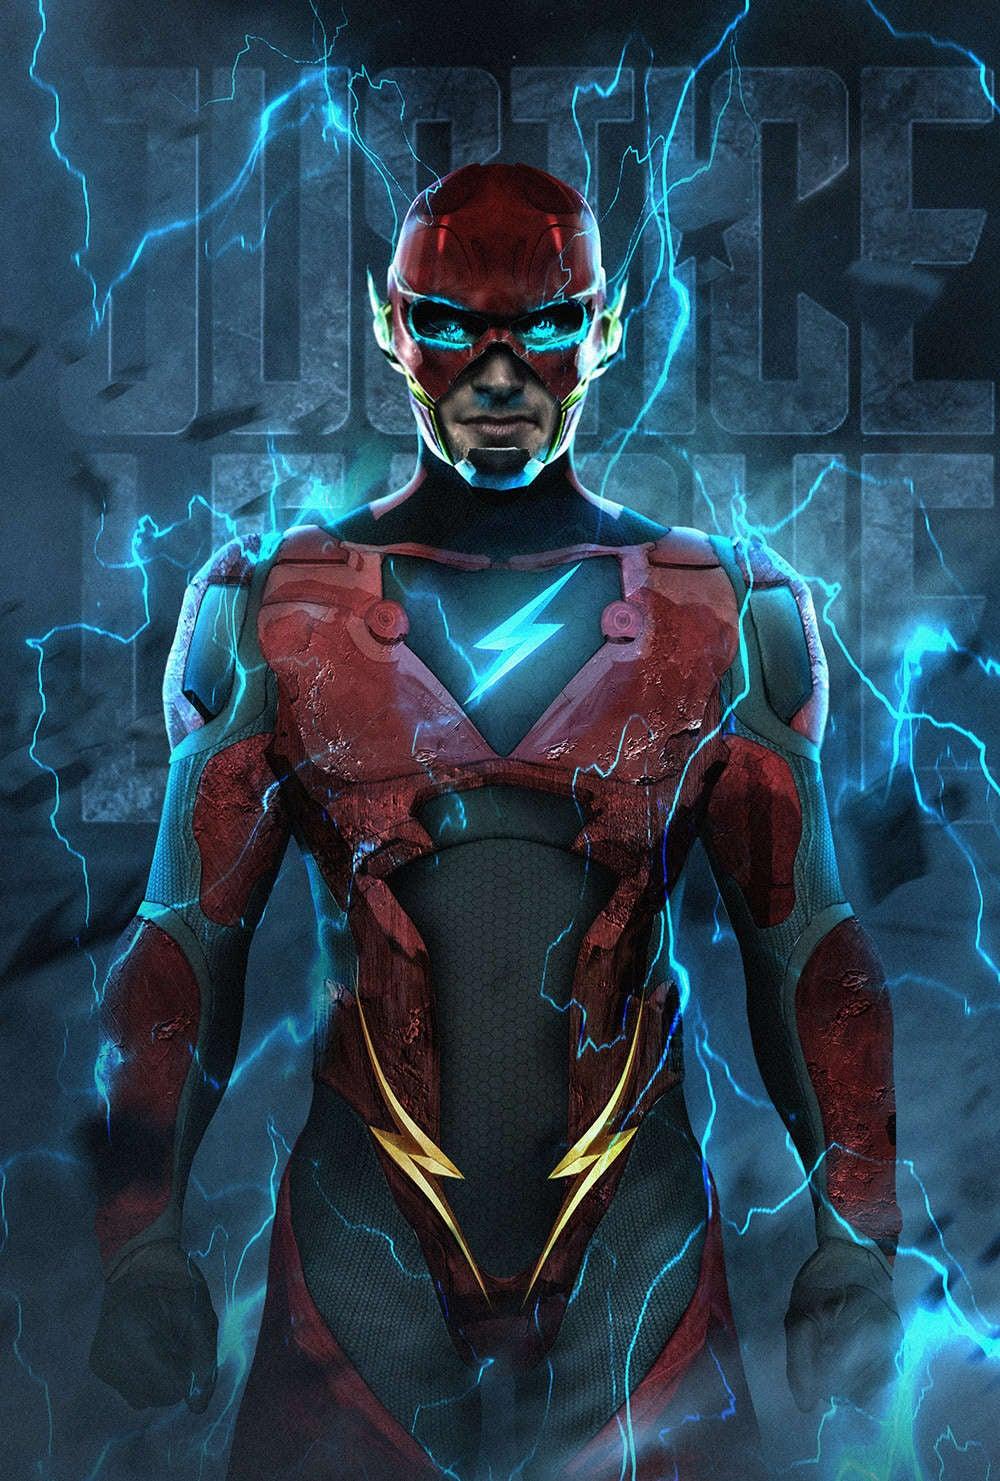 Justice league - Super hero flash ...